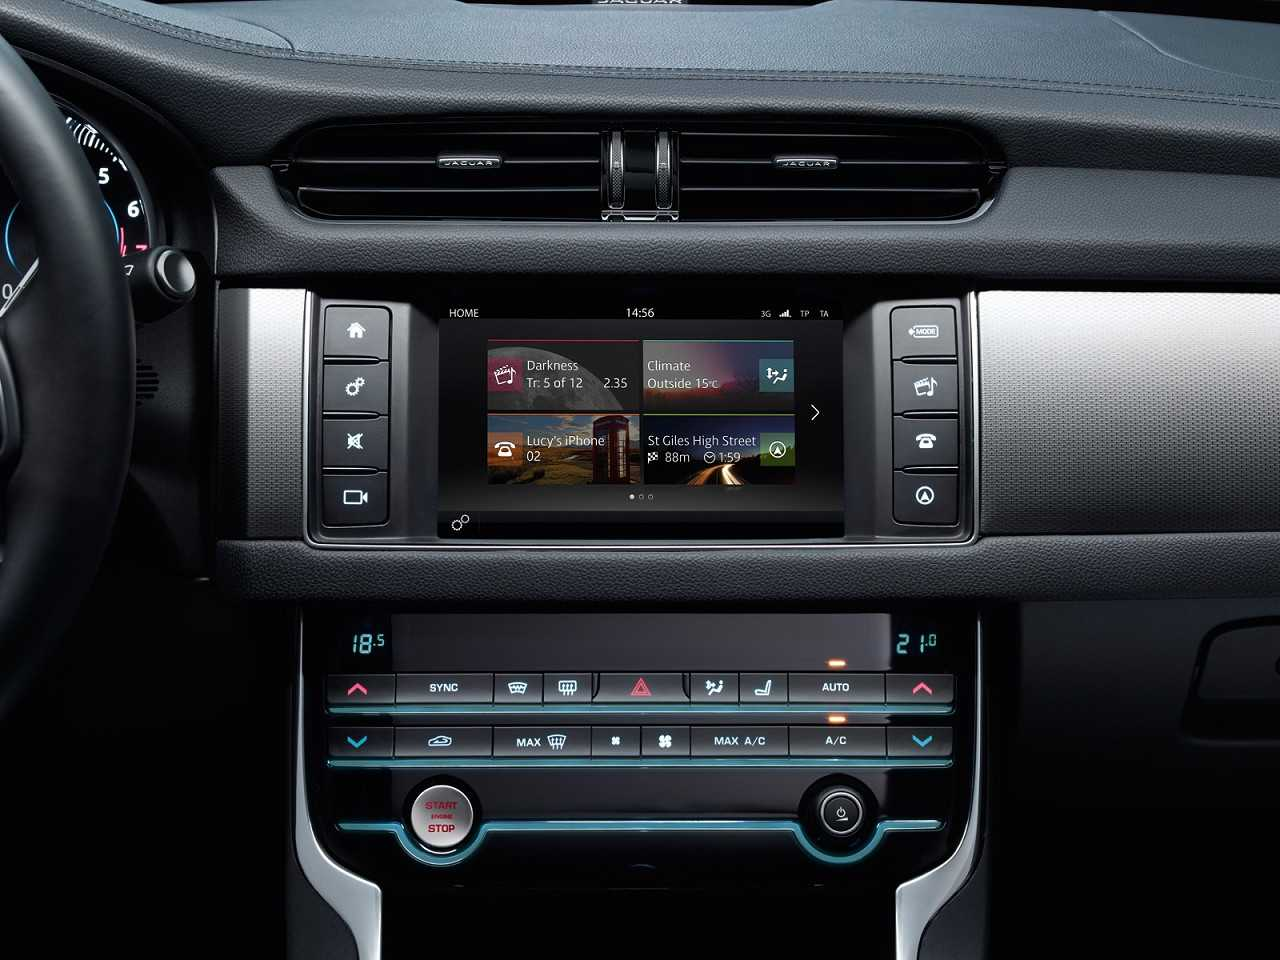 JaguarXF 2016 - console central